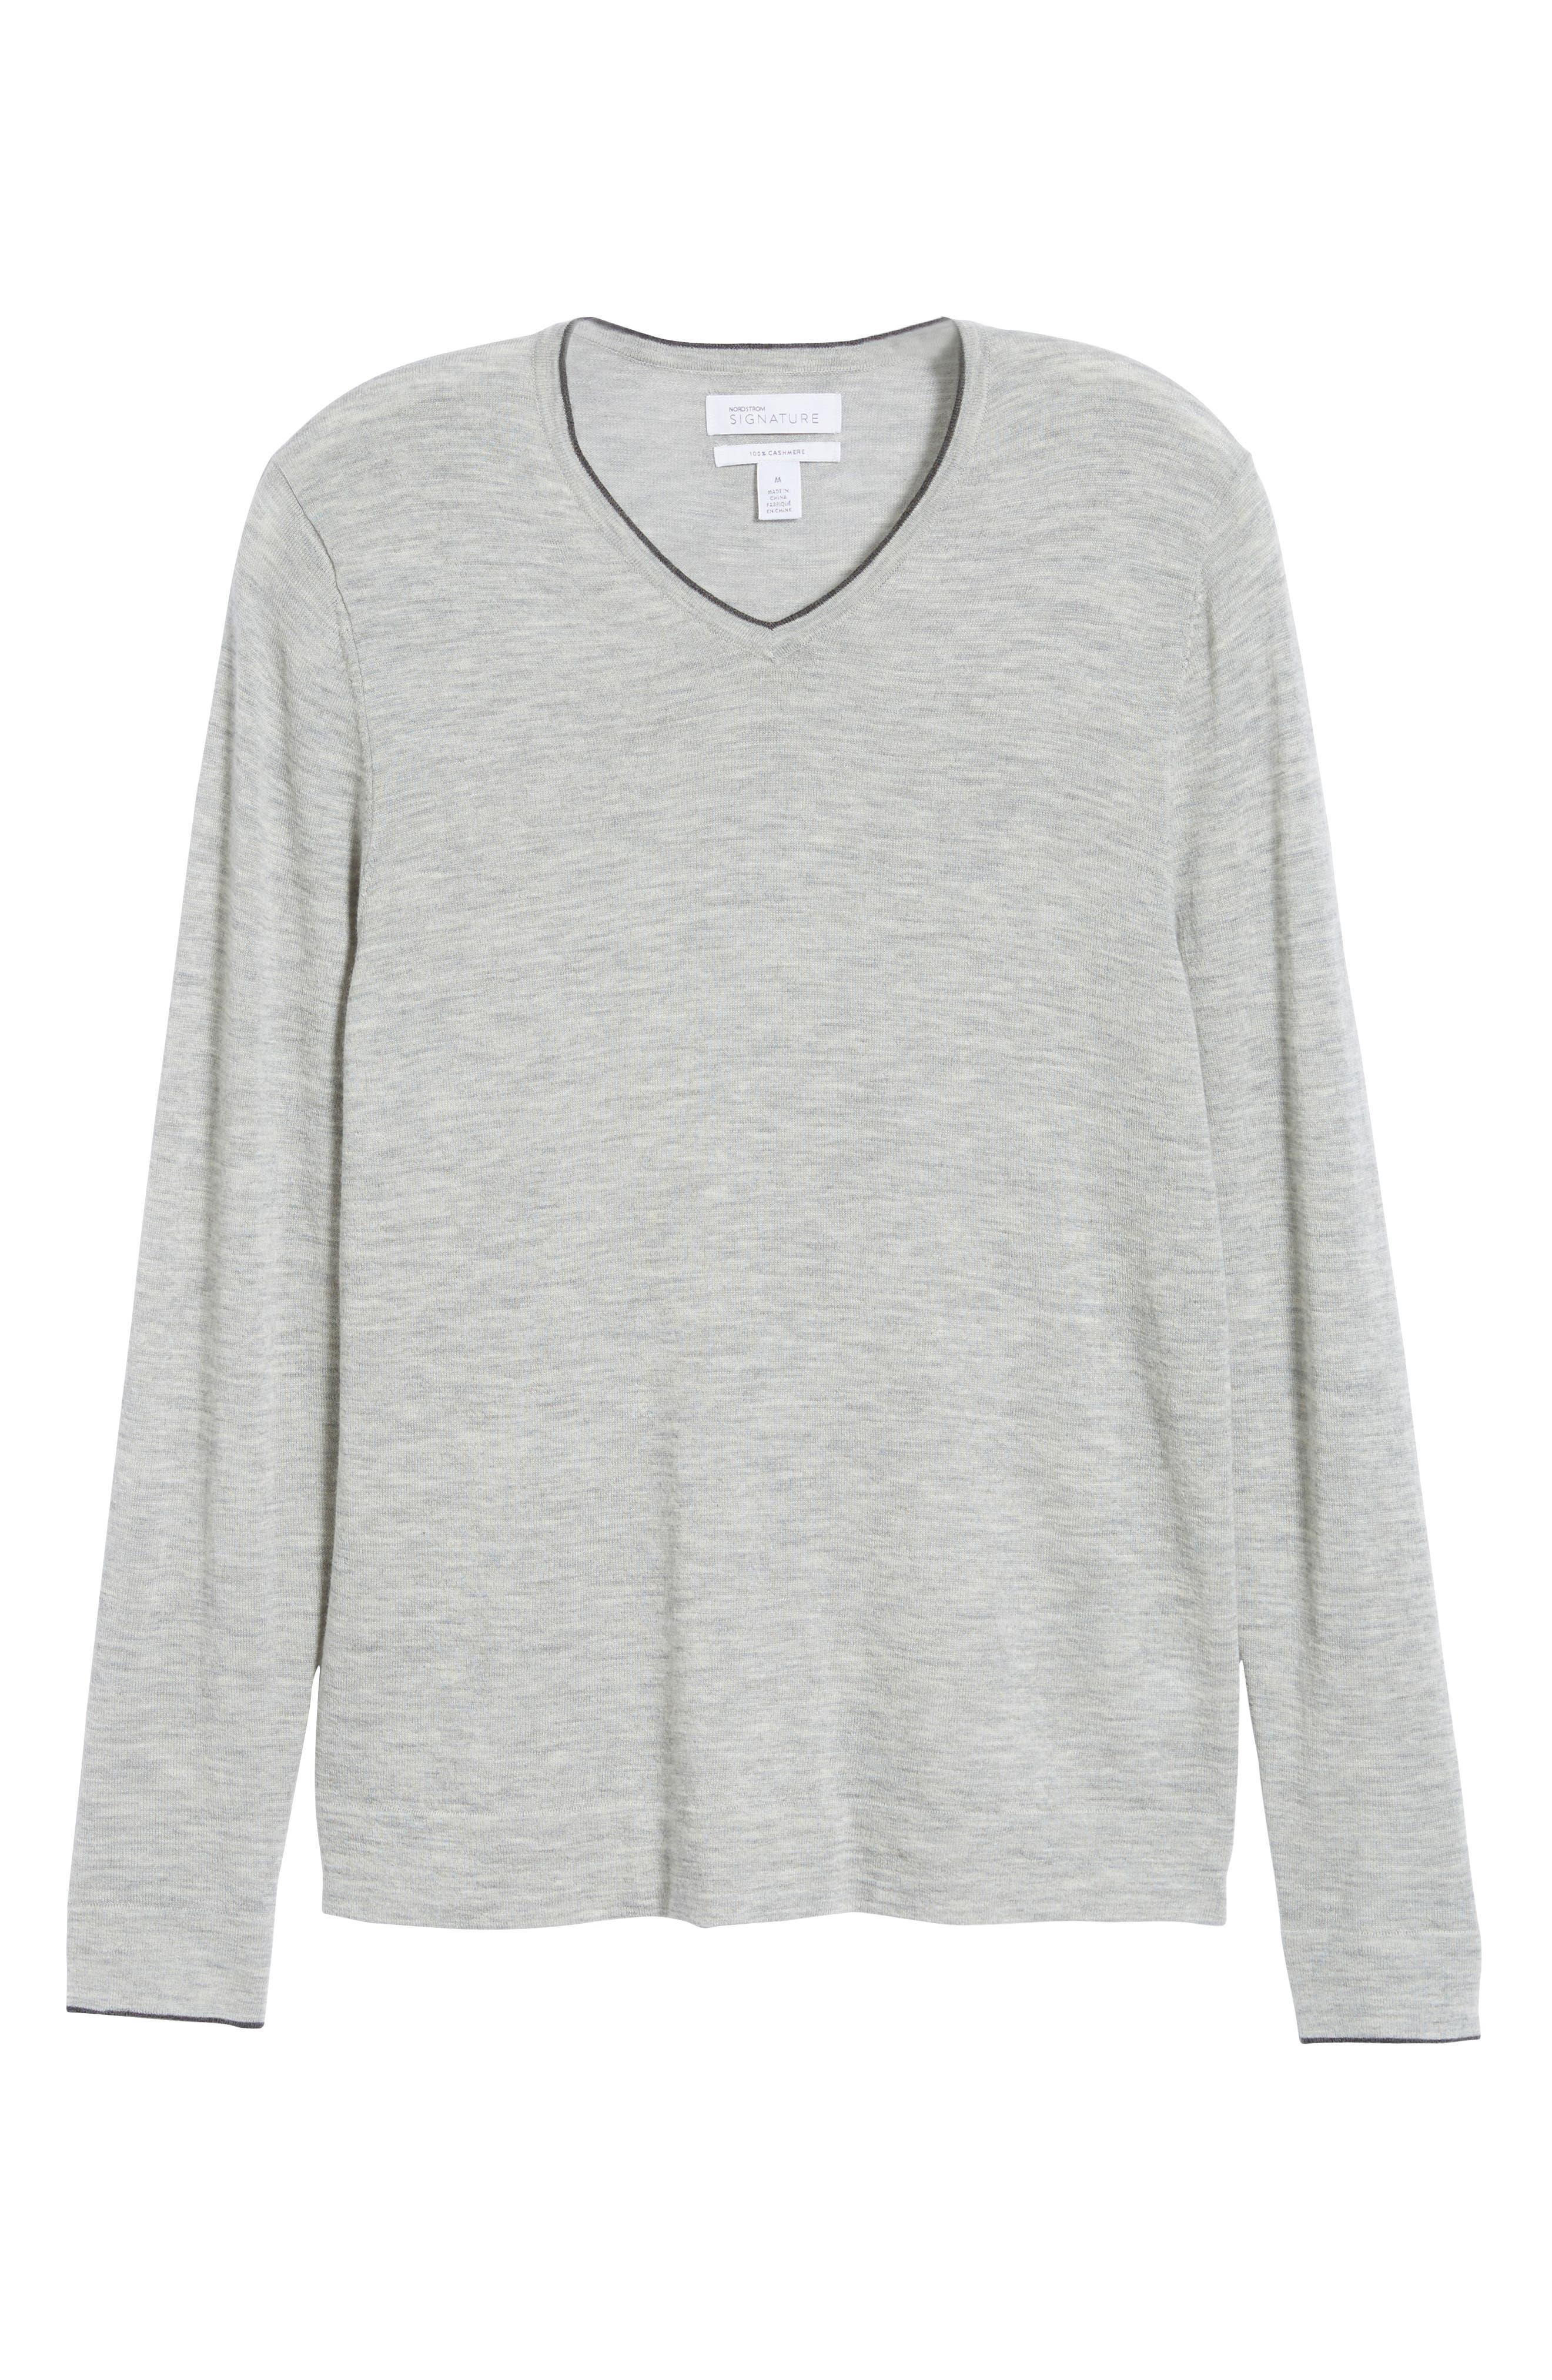 NORDSTROM SIGNATURE,                             Cashmere V-Neck Sweater,                             Alternate thumbnail 6, color,                             050